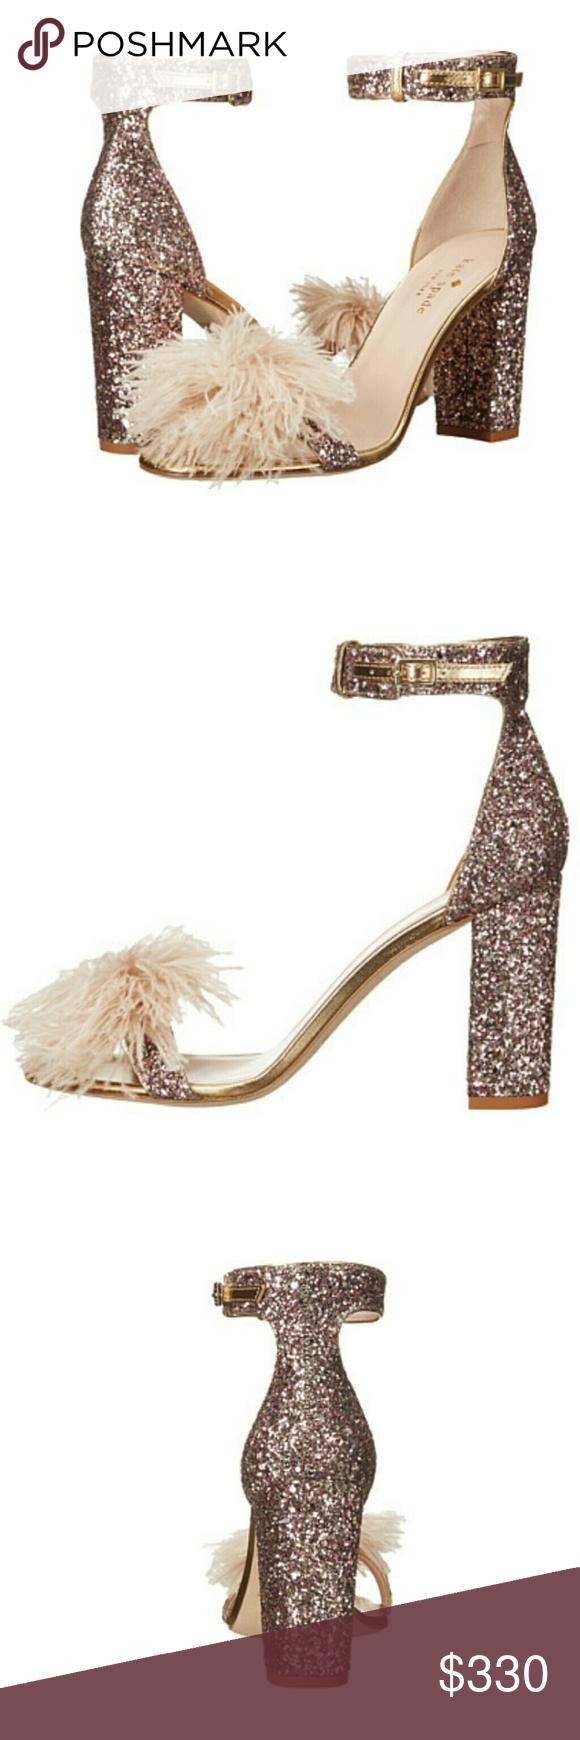 83dfba5ba920 NWT Kate Spade Rose Gold Glitter Heels Brand New Glamorous Kate Spade rose  gold glittered high